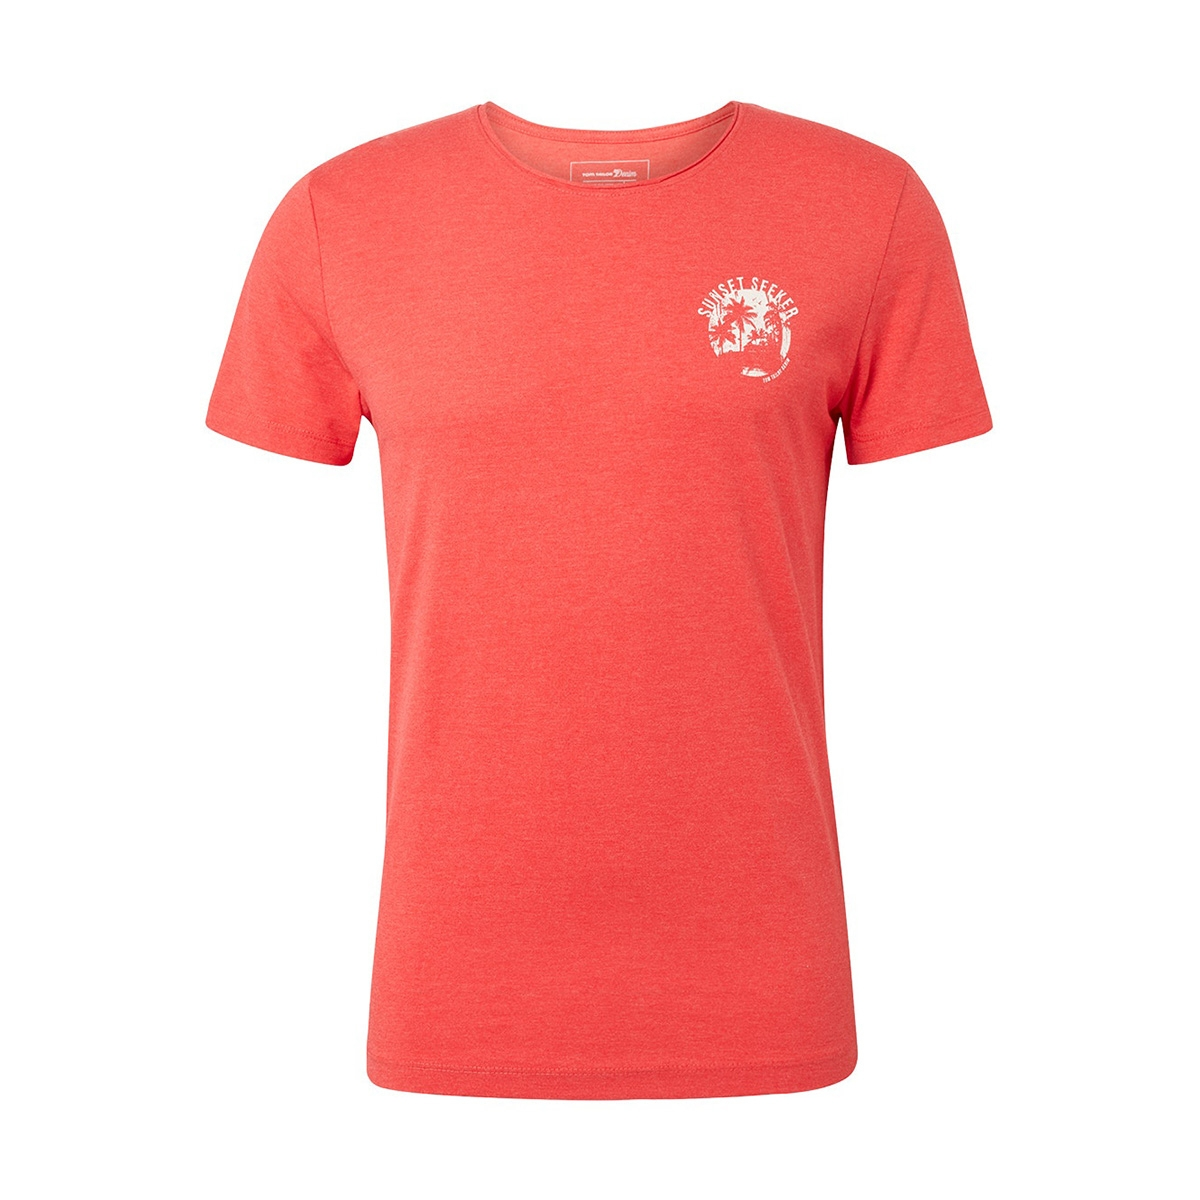 t shirt met print 1010045xx12 tom tailor t-shirt 11072